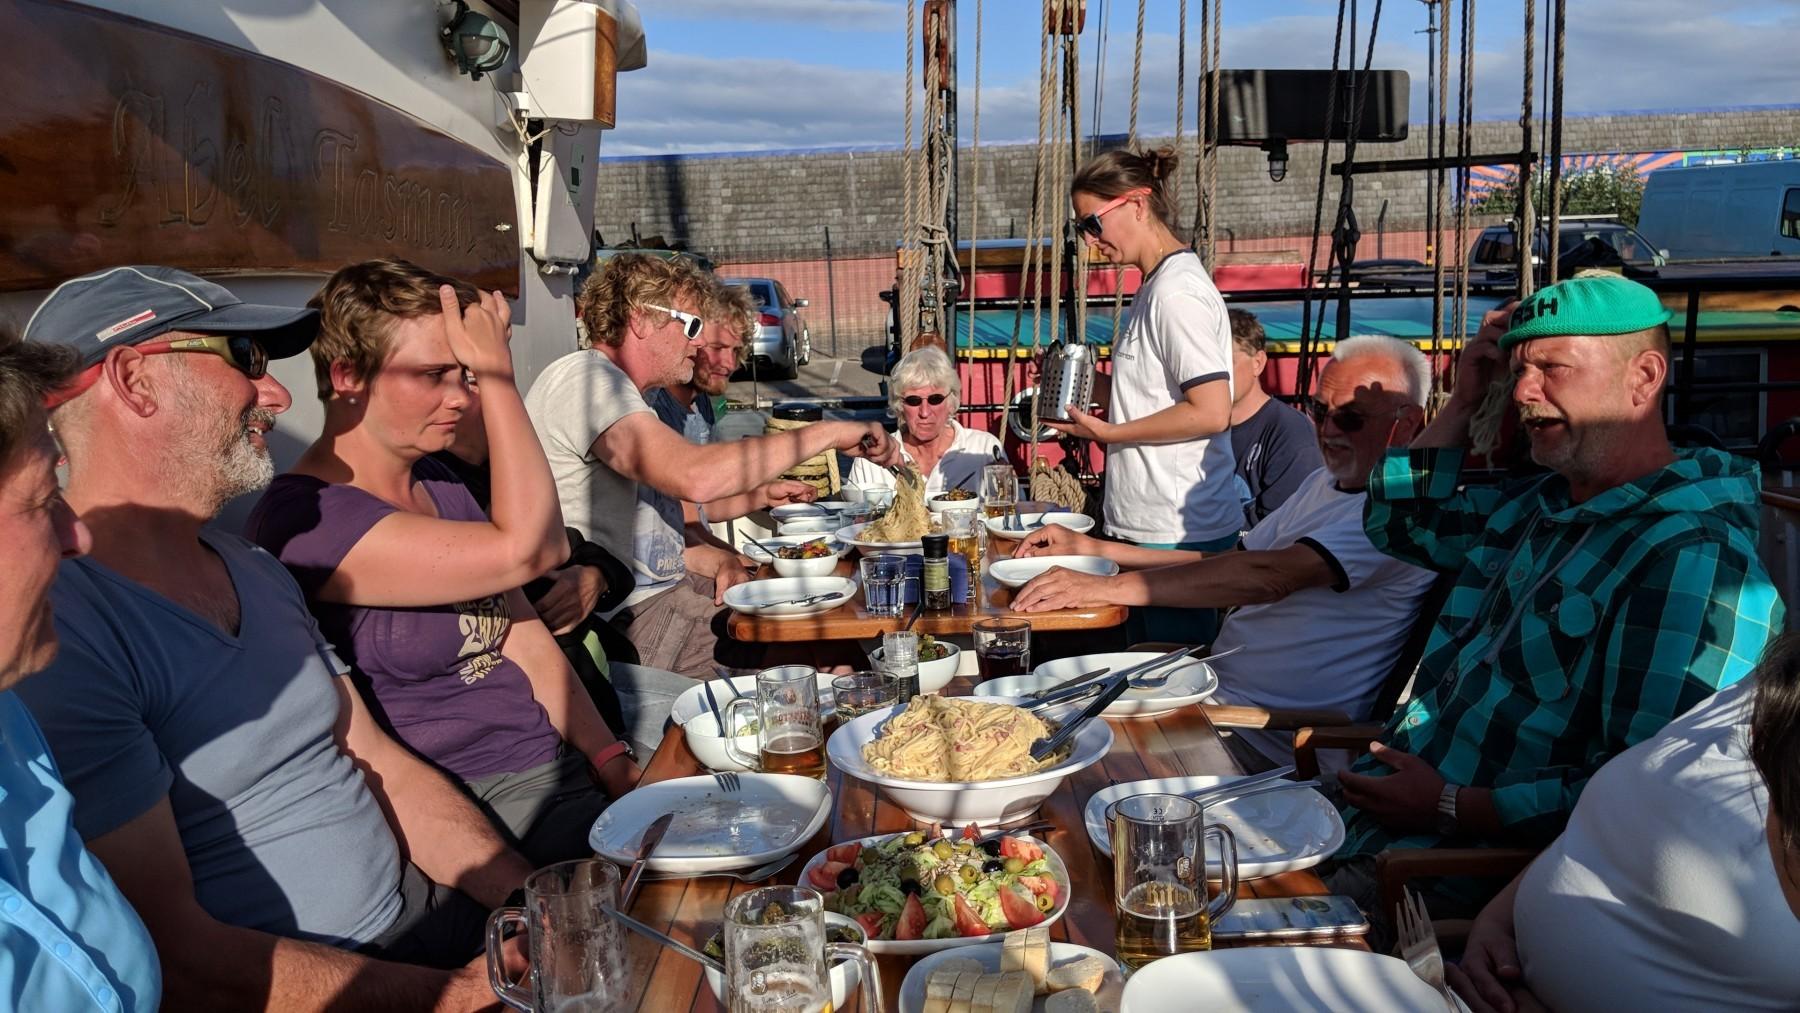 Woche segeln - ABEL TASMAN